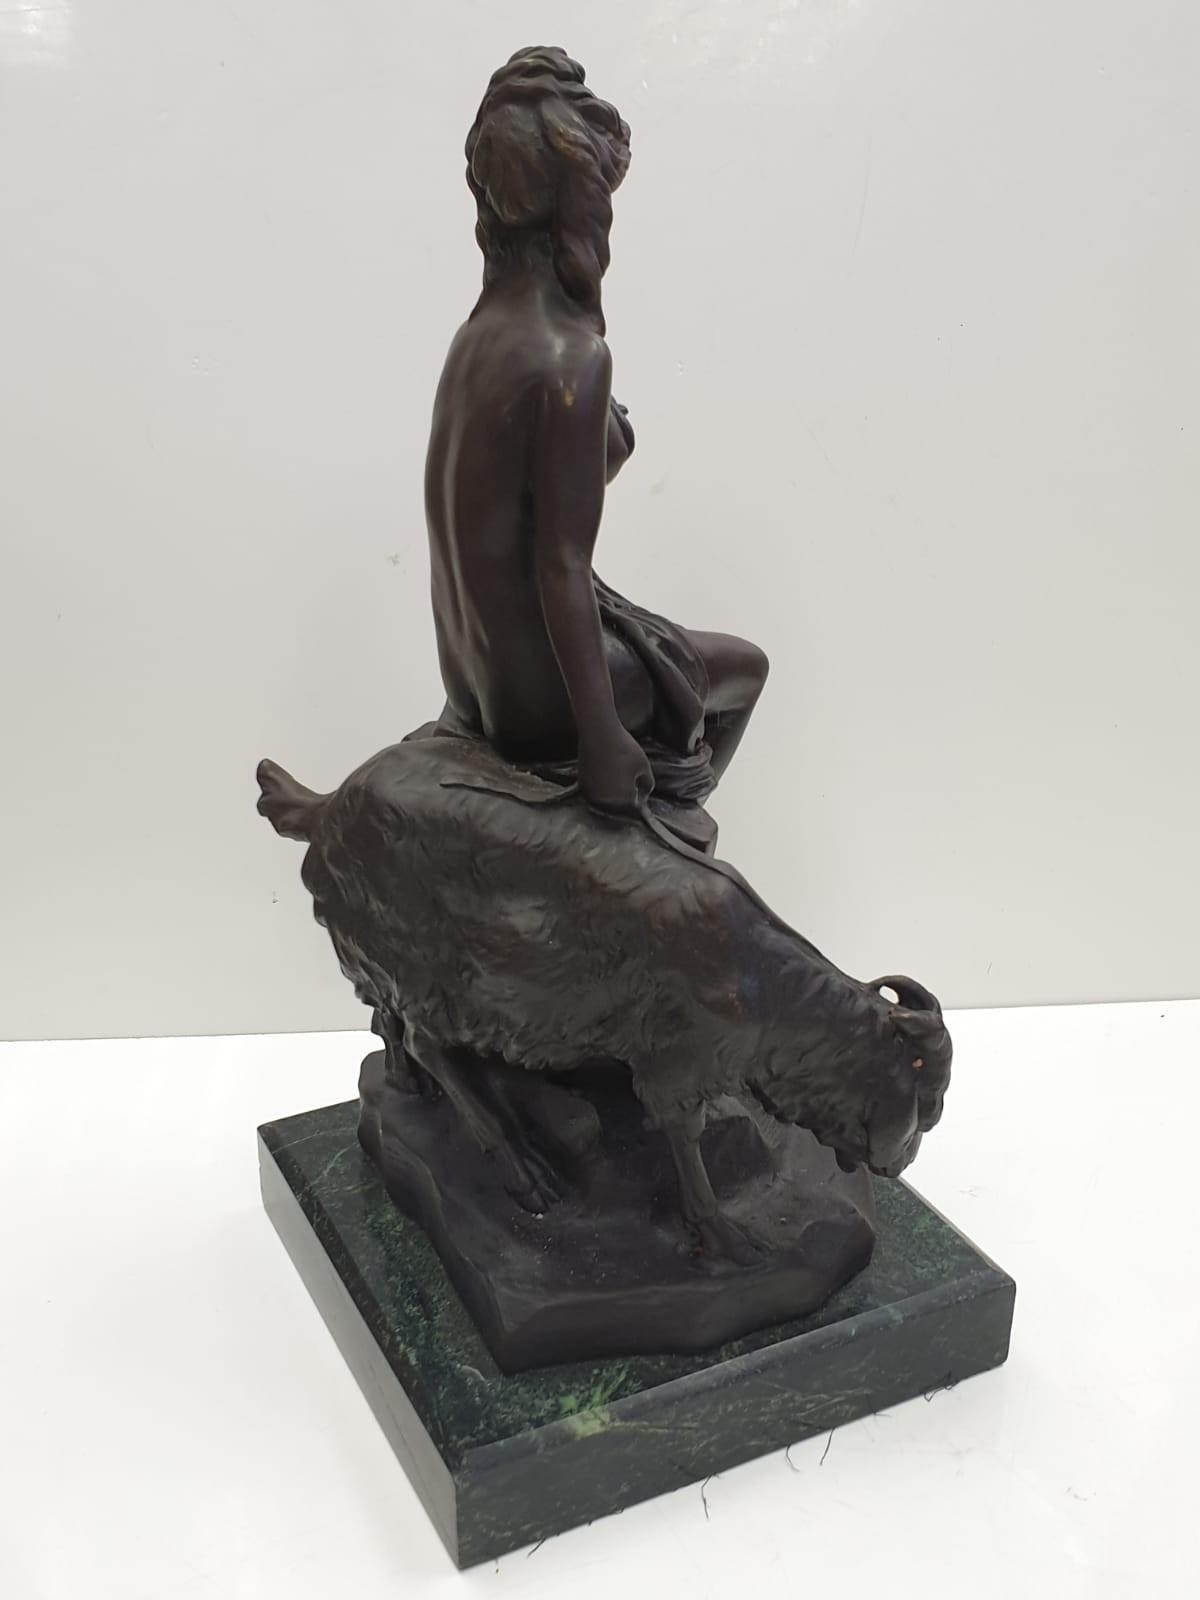 Bronze Pierre Julien figurine on plinth. 'Amalthea and Jupiter's Goat'. Height 45cm. Weight 9.7kg - Image 10 of 27